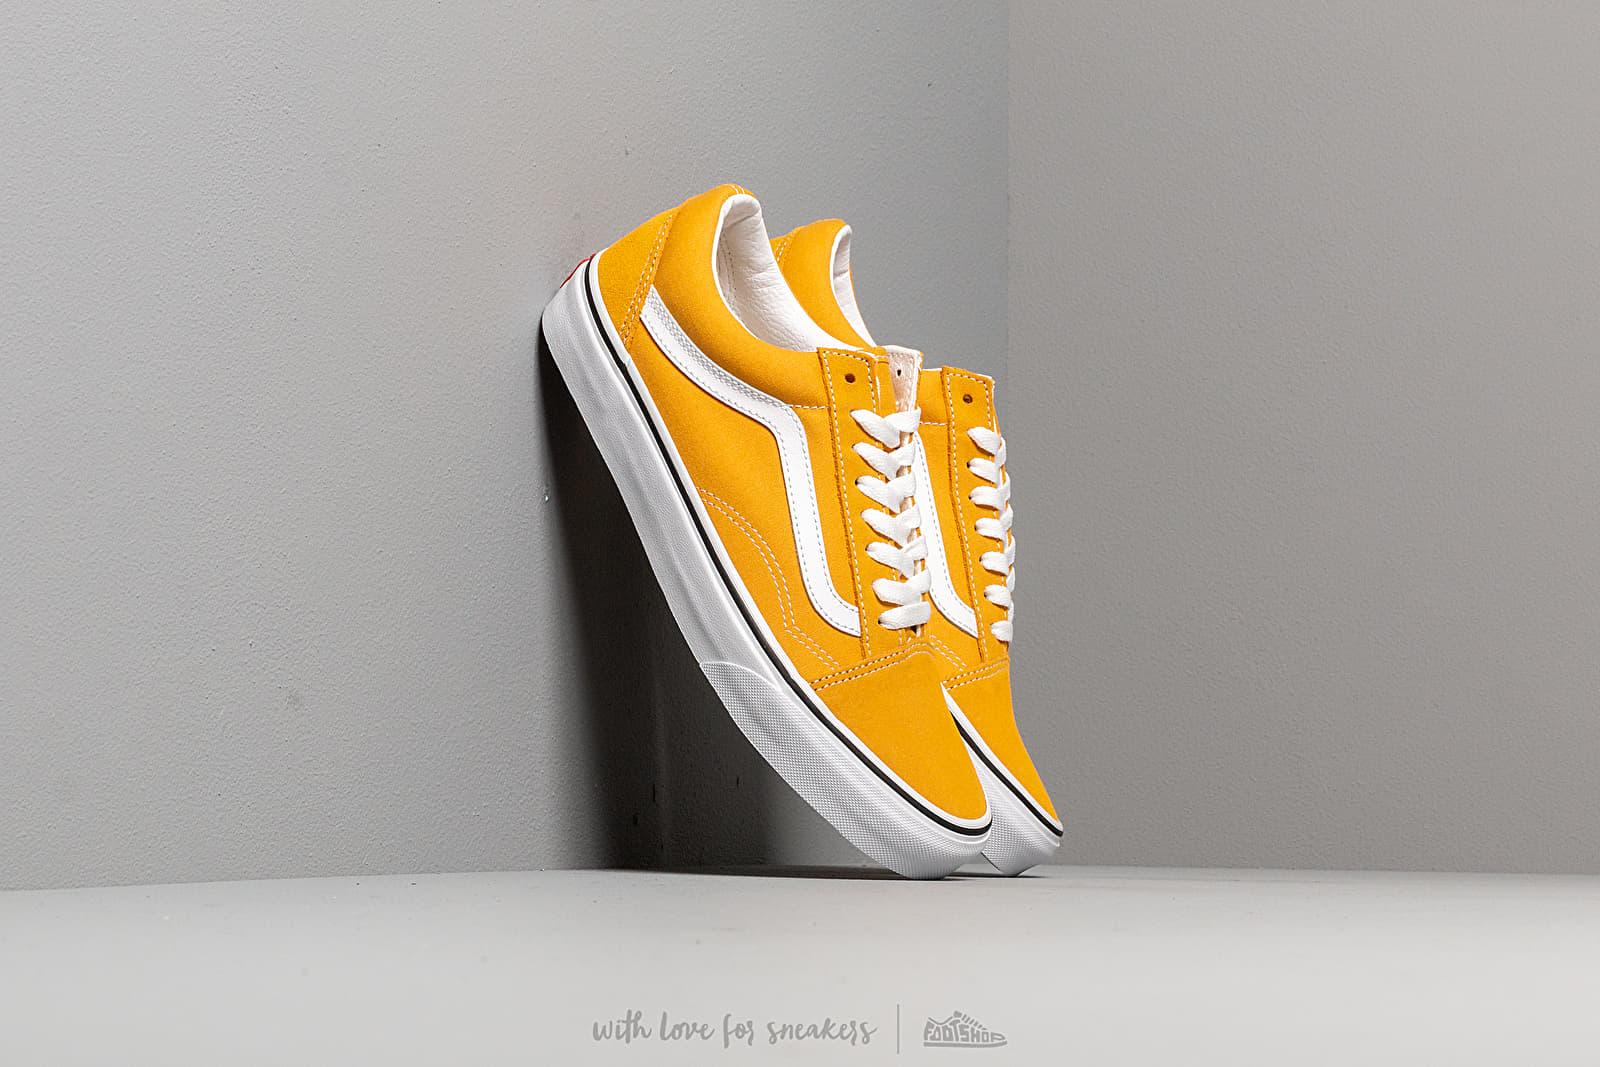 Vans Old Skool Yolk Yellow/ True White za skvelú cenu 66 € kúpite na Footshop.sk